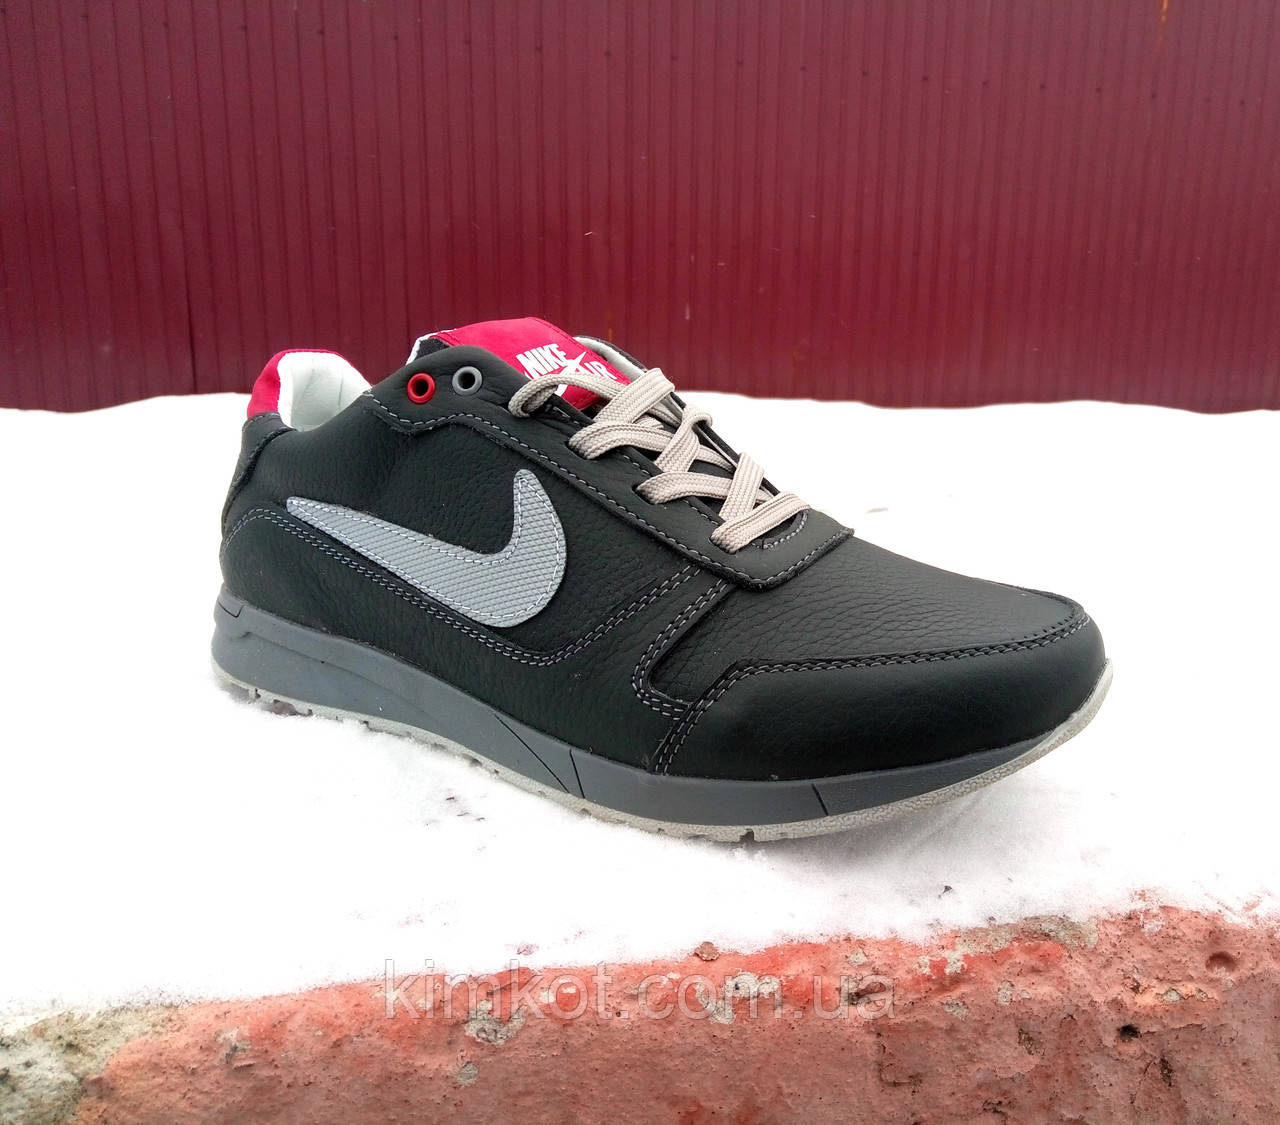 6485f1e7a786 Кроссовки мужские кожаные Nike 40 -45 р-р  продажа, цена в Харькове ...